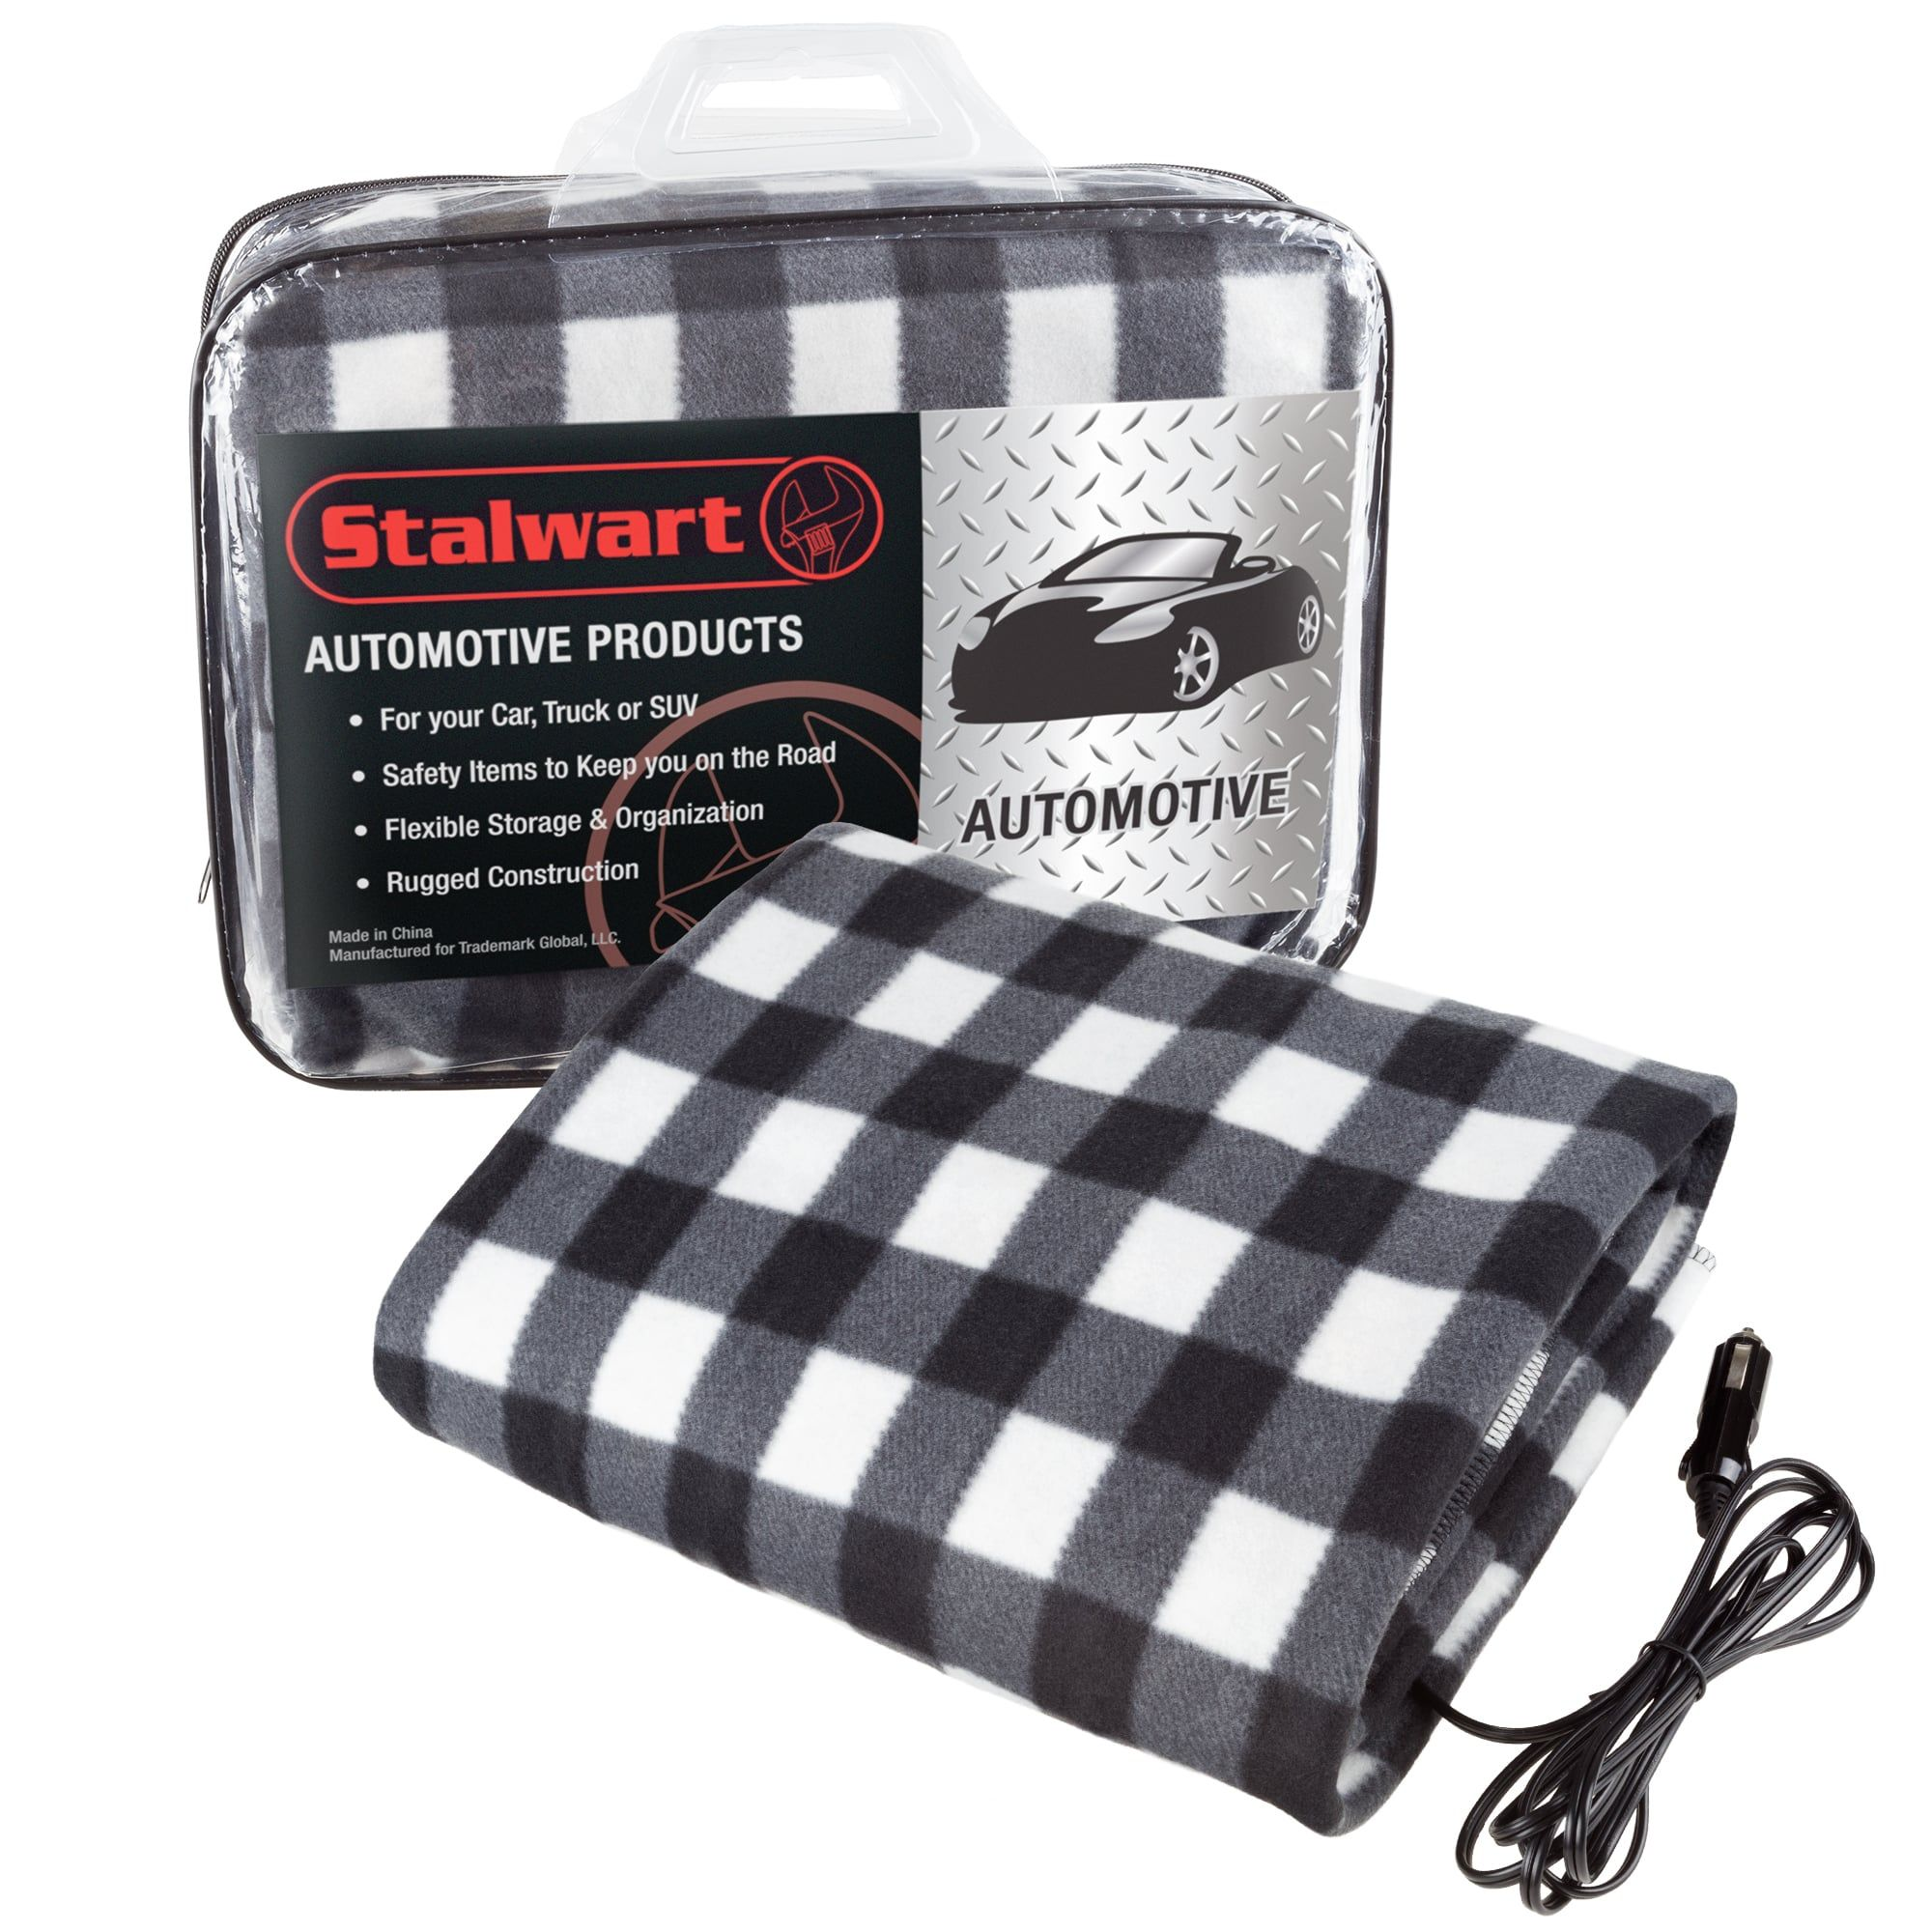 Stalwart Electric Heater Car Blanket Gift Ideas Car Blanket